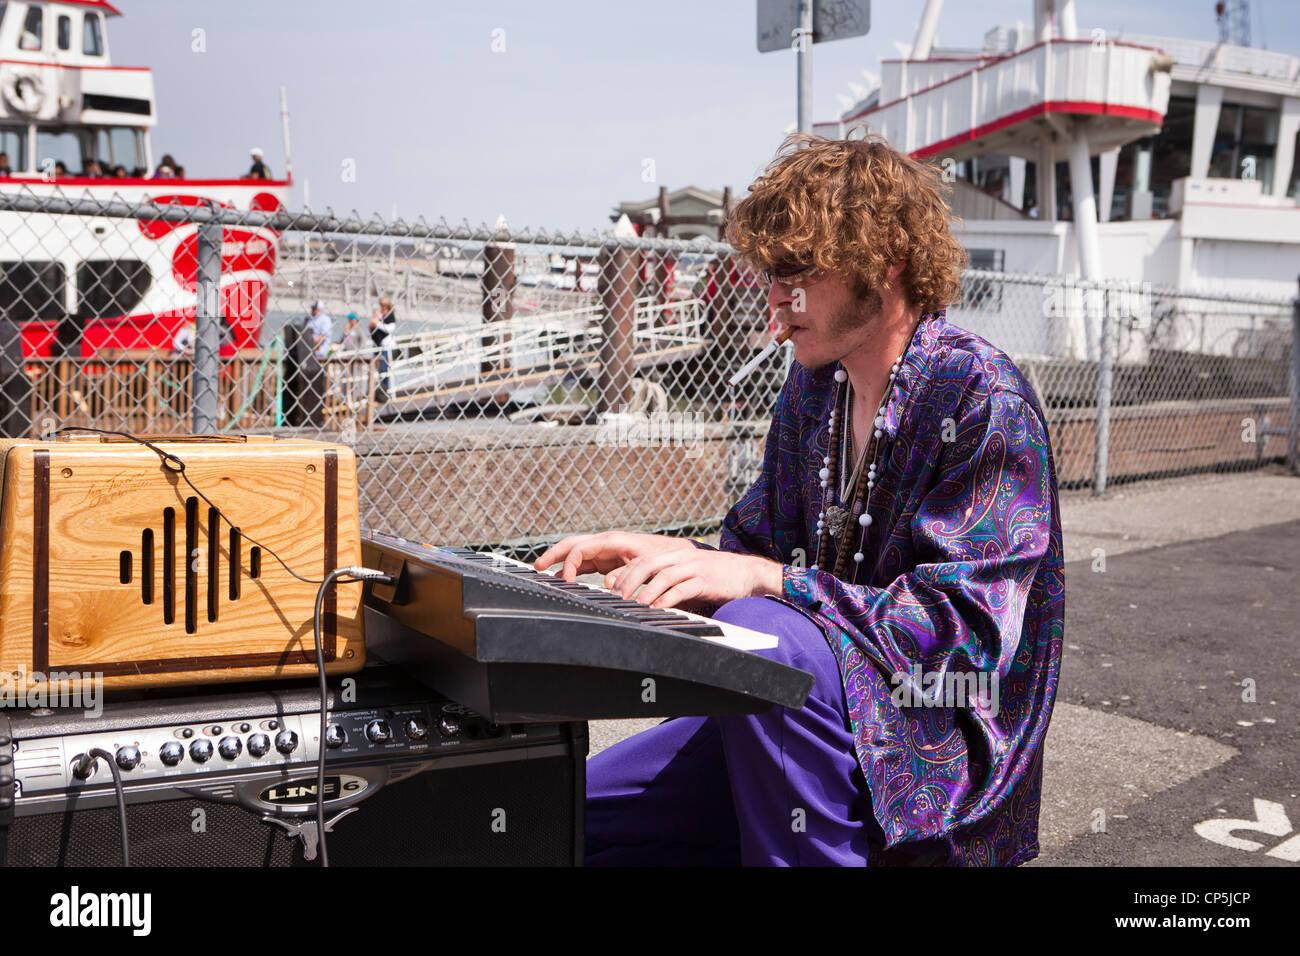 Street musician playing the keyboard - San Francisco, California USA - Stock Image